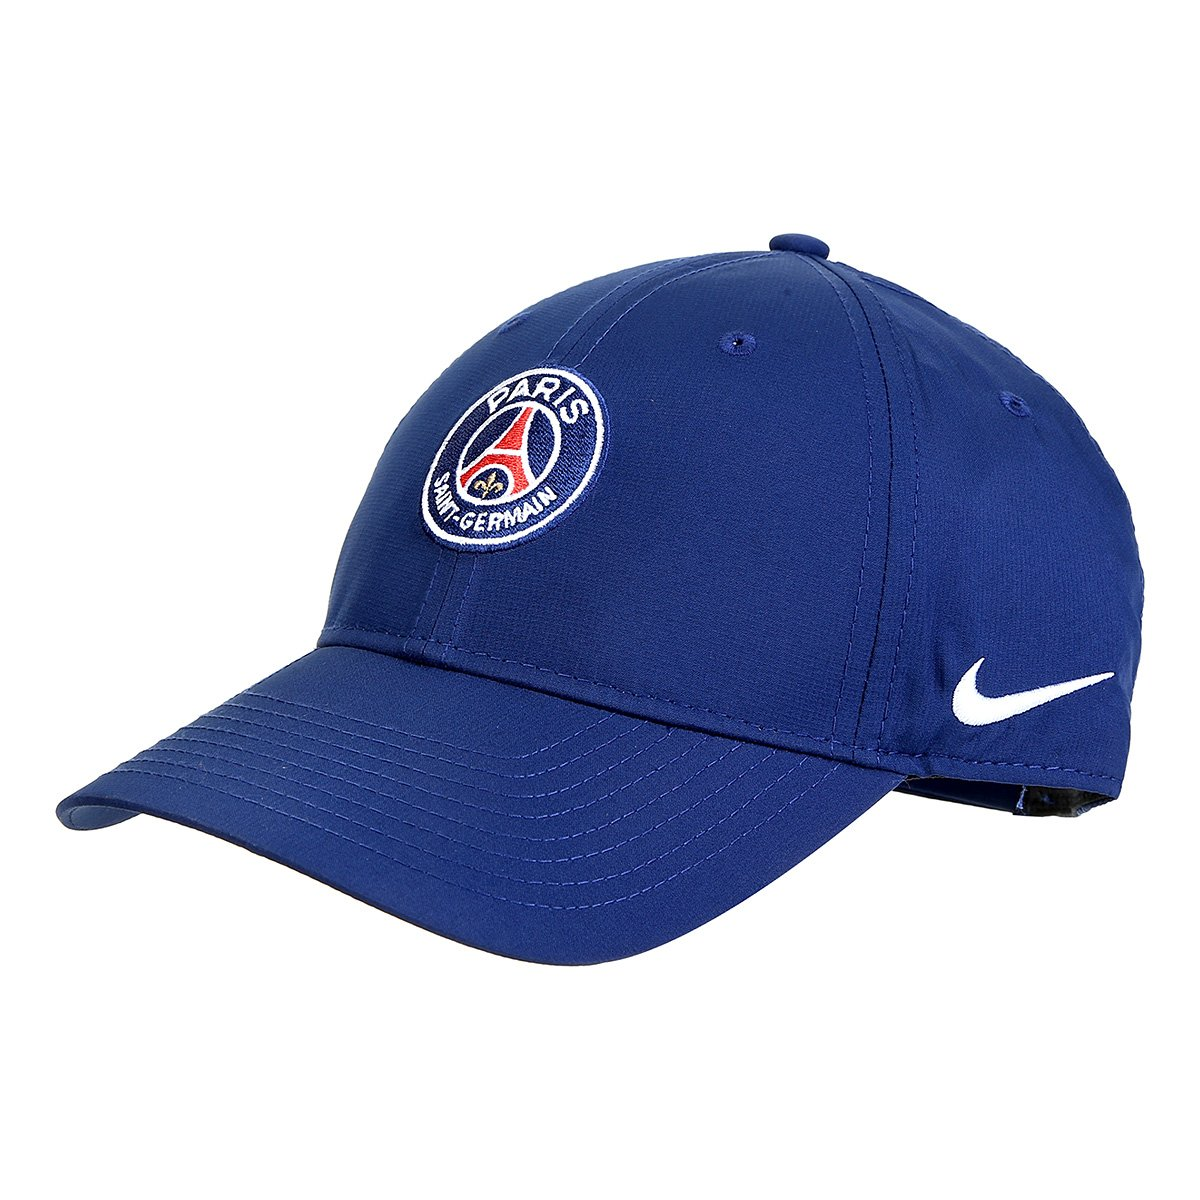 new product 1460b 80217 Boné Paris Saint-Germain Nike Aba Curva Dry L91 - Azul e Branco